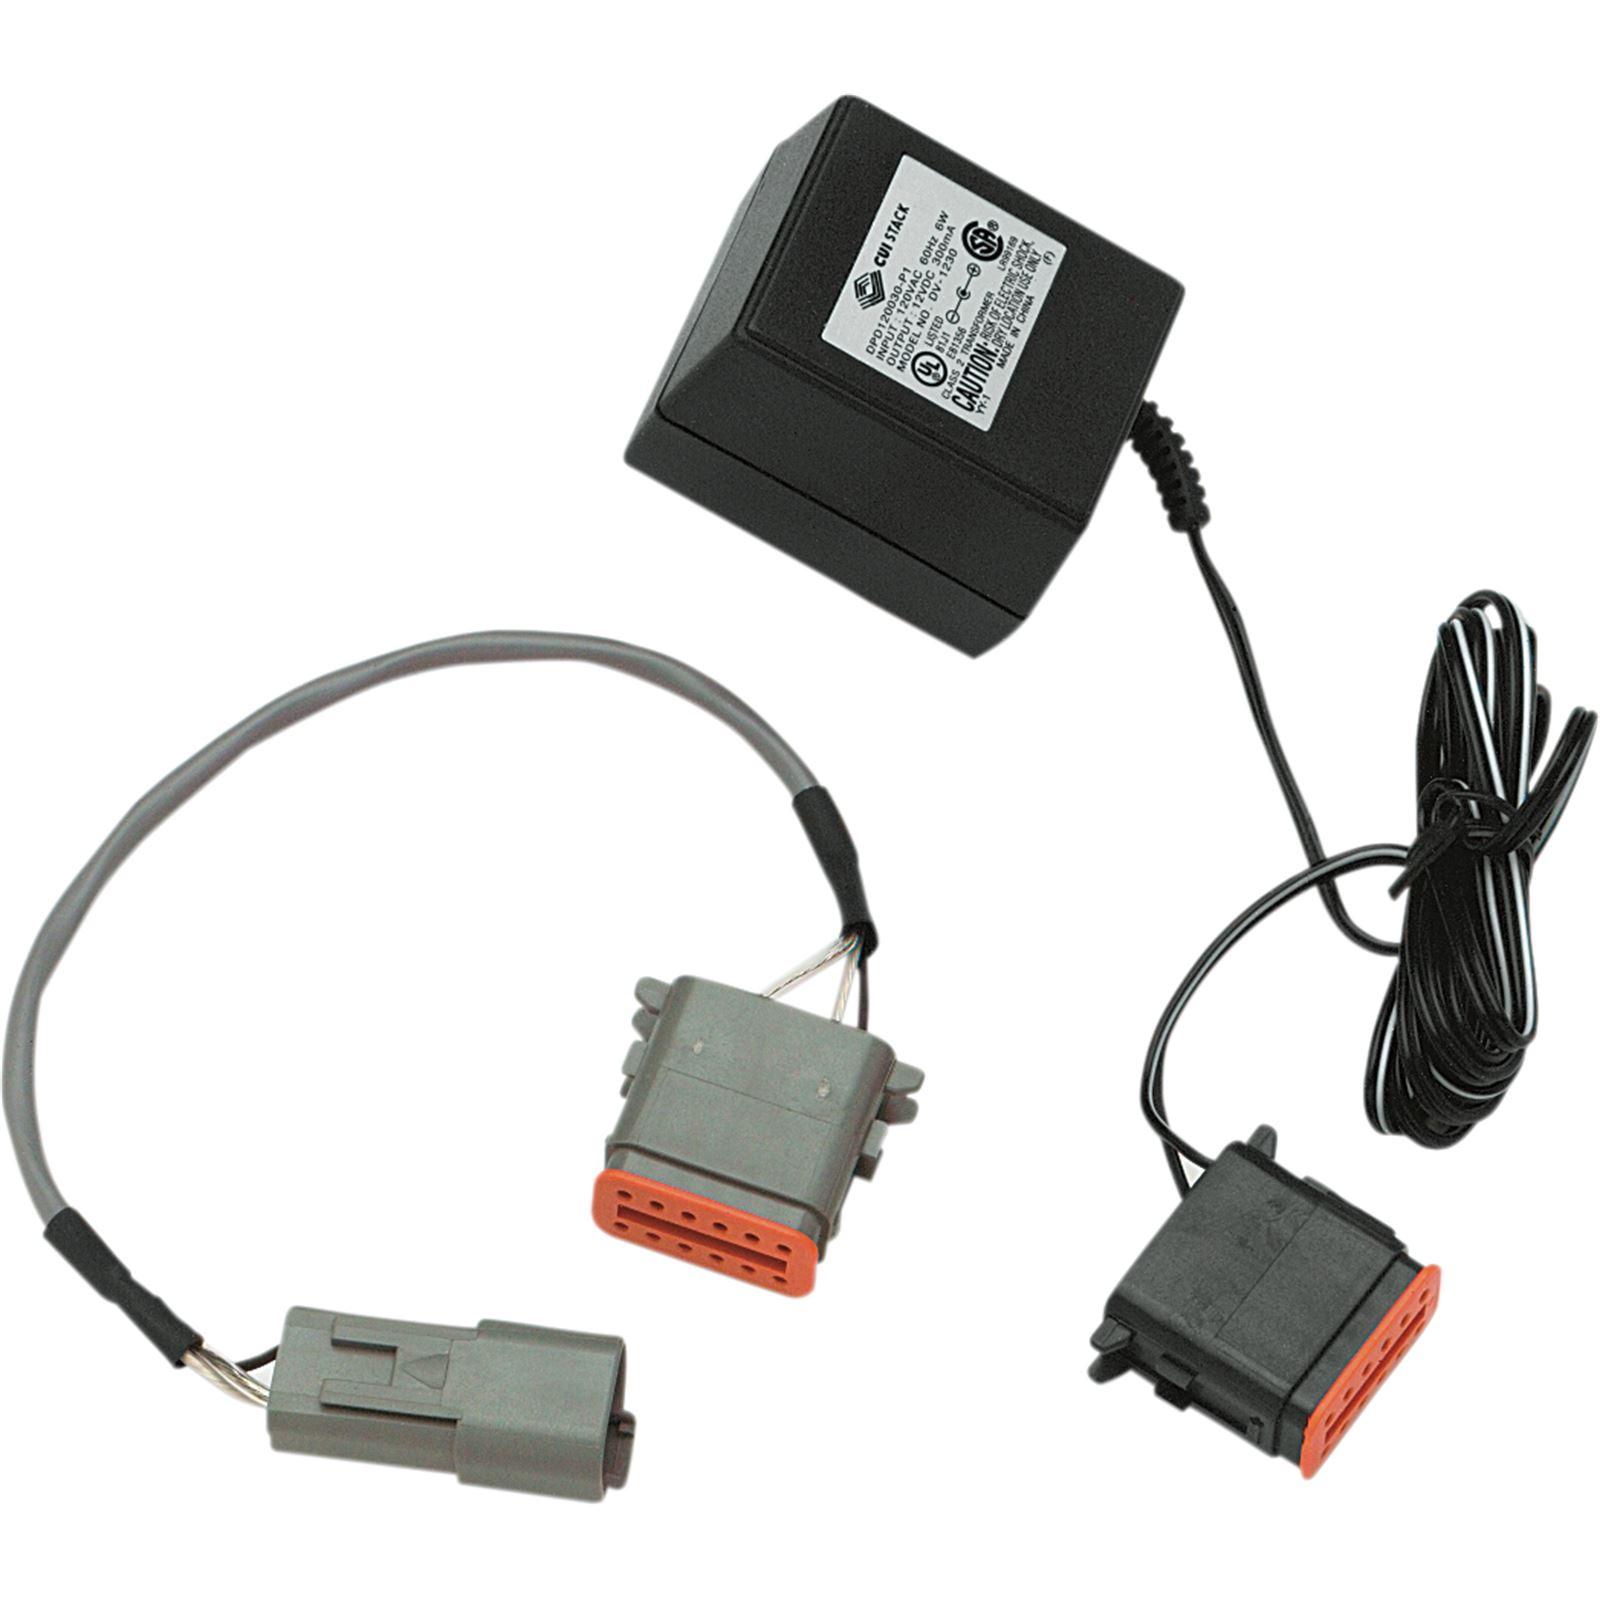 Daytona Twin Tec Power Adapter